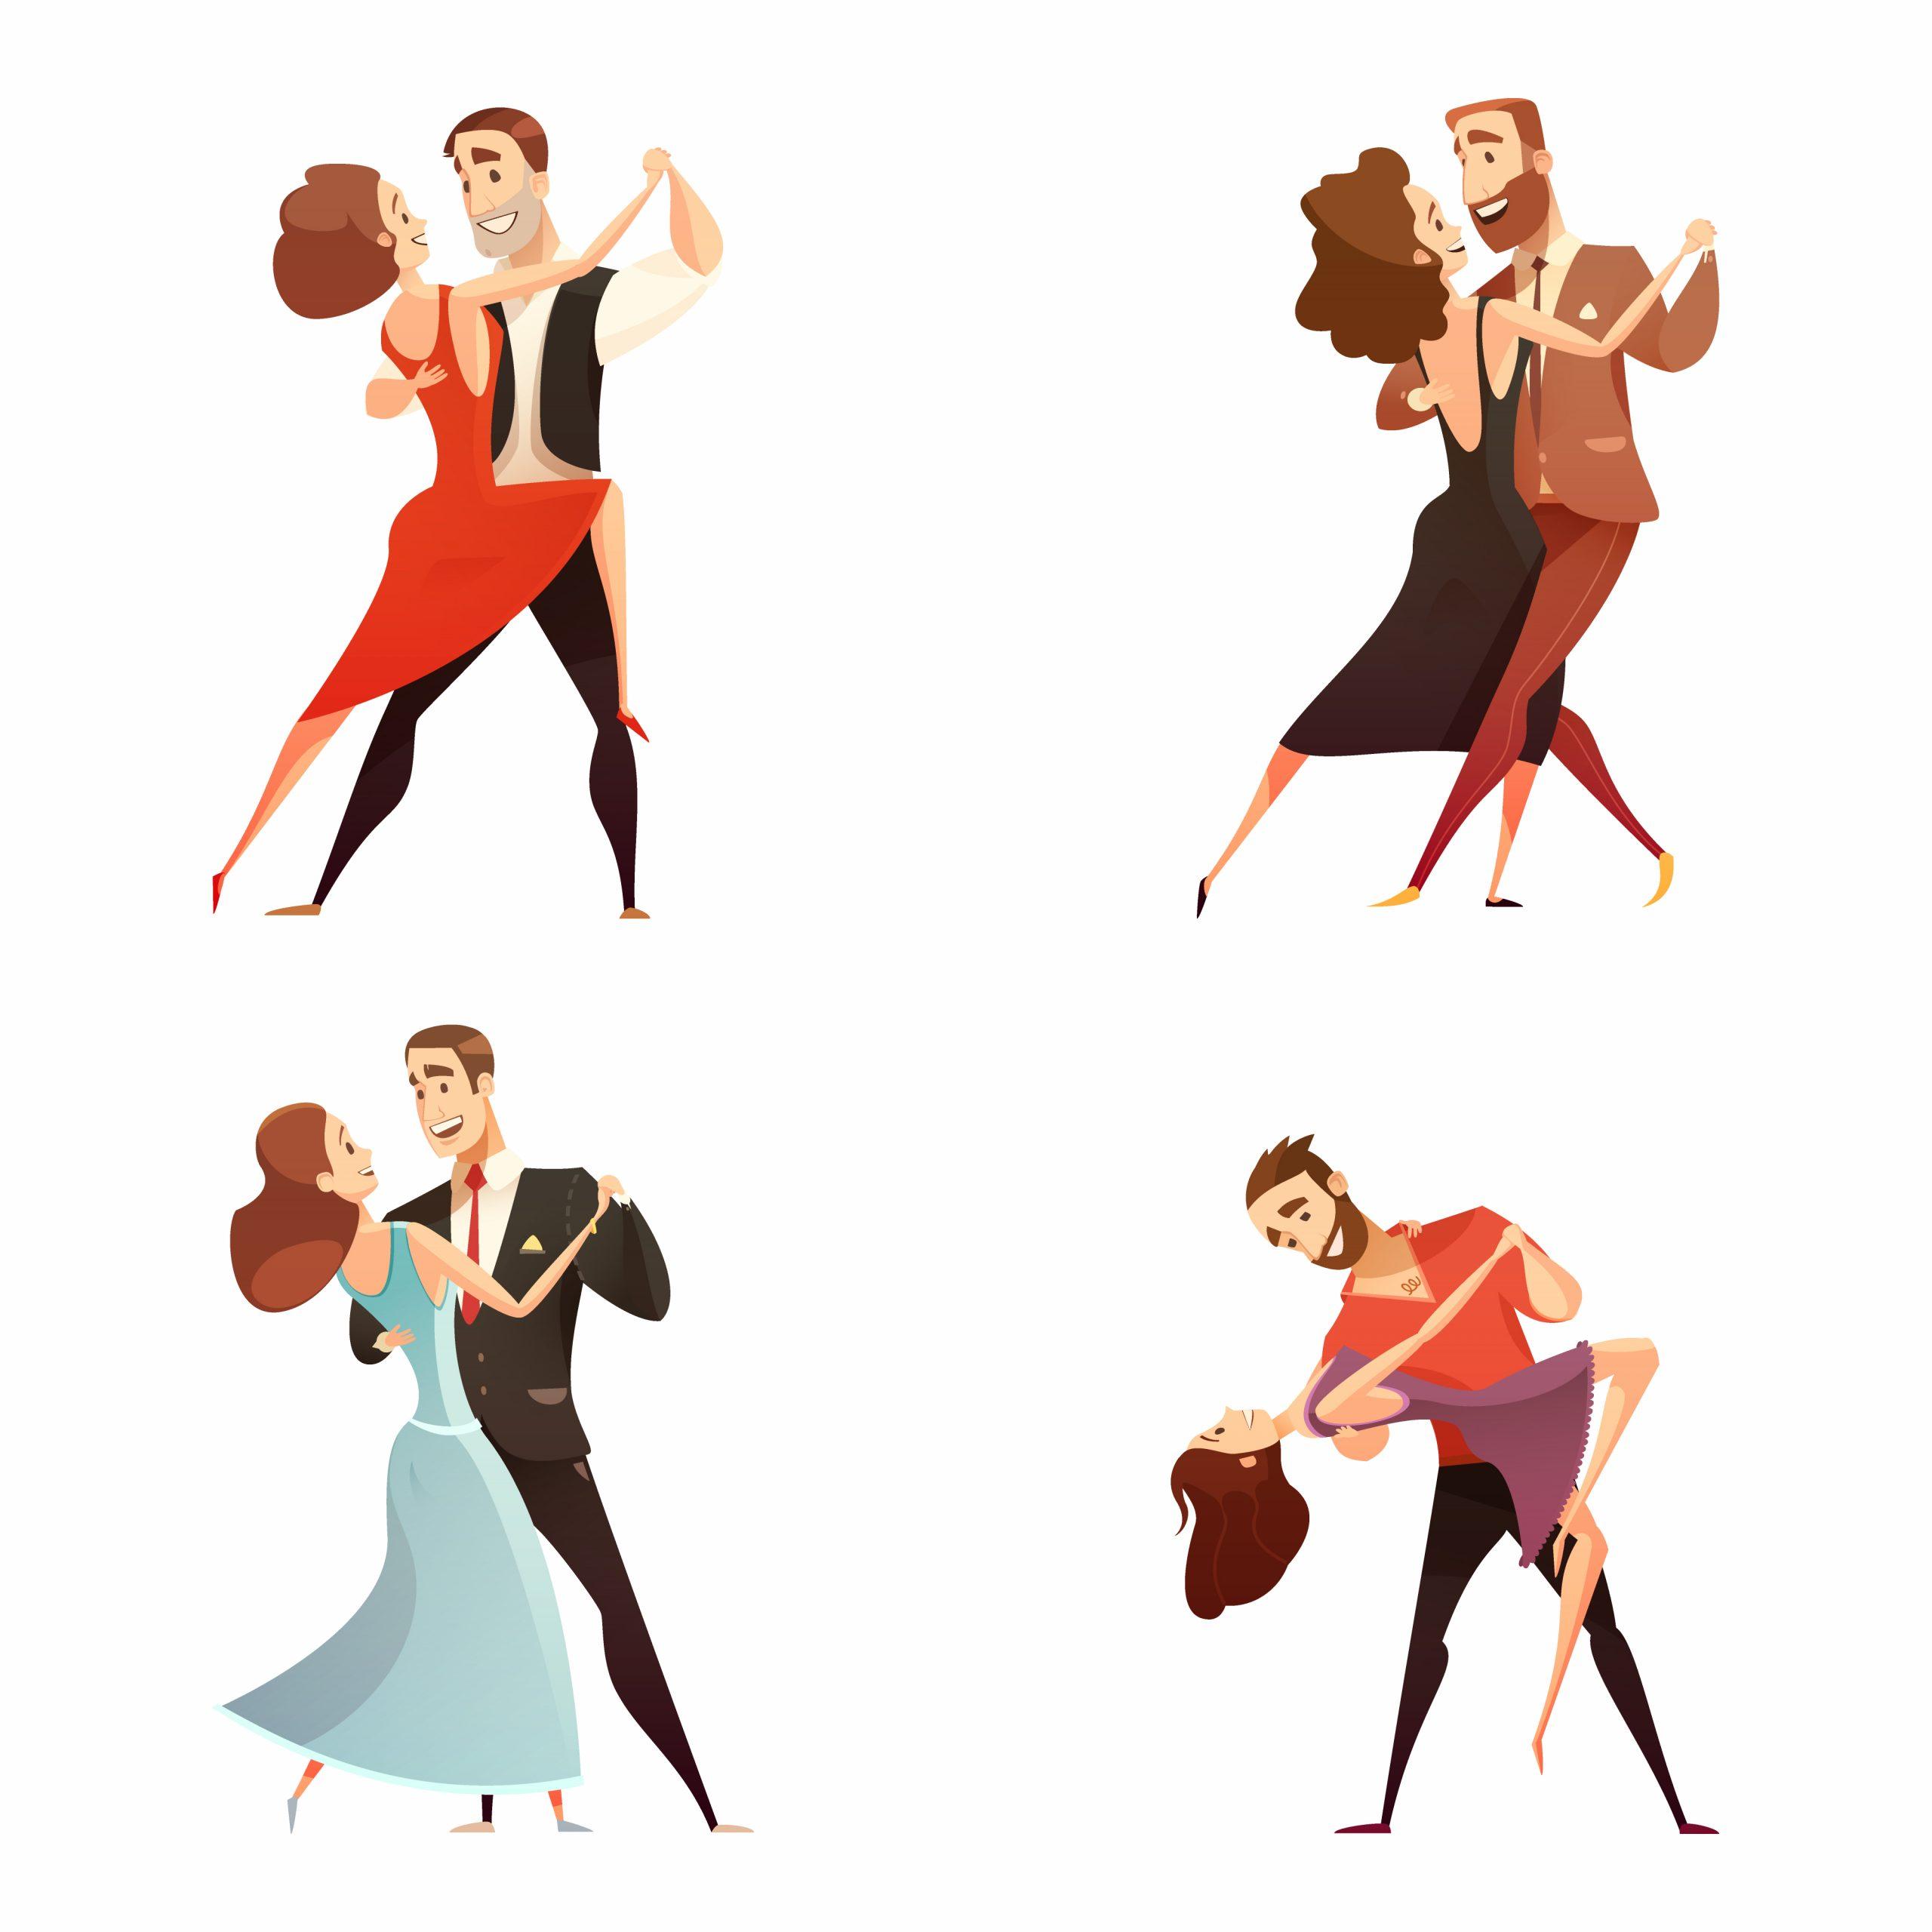 BEAUTIFUL DANCING FRED ASTAIRE & RITA HAYWORTH